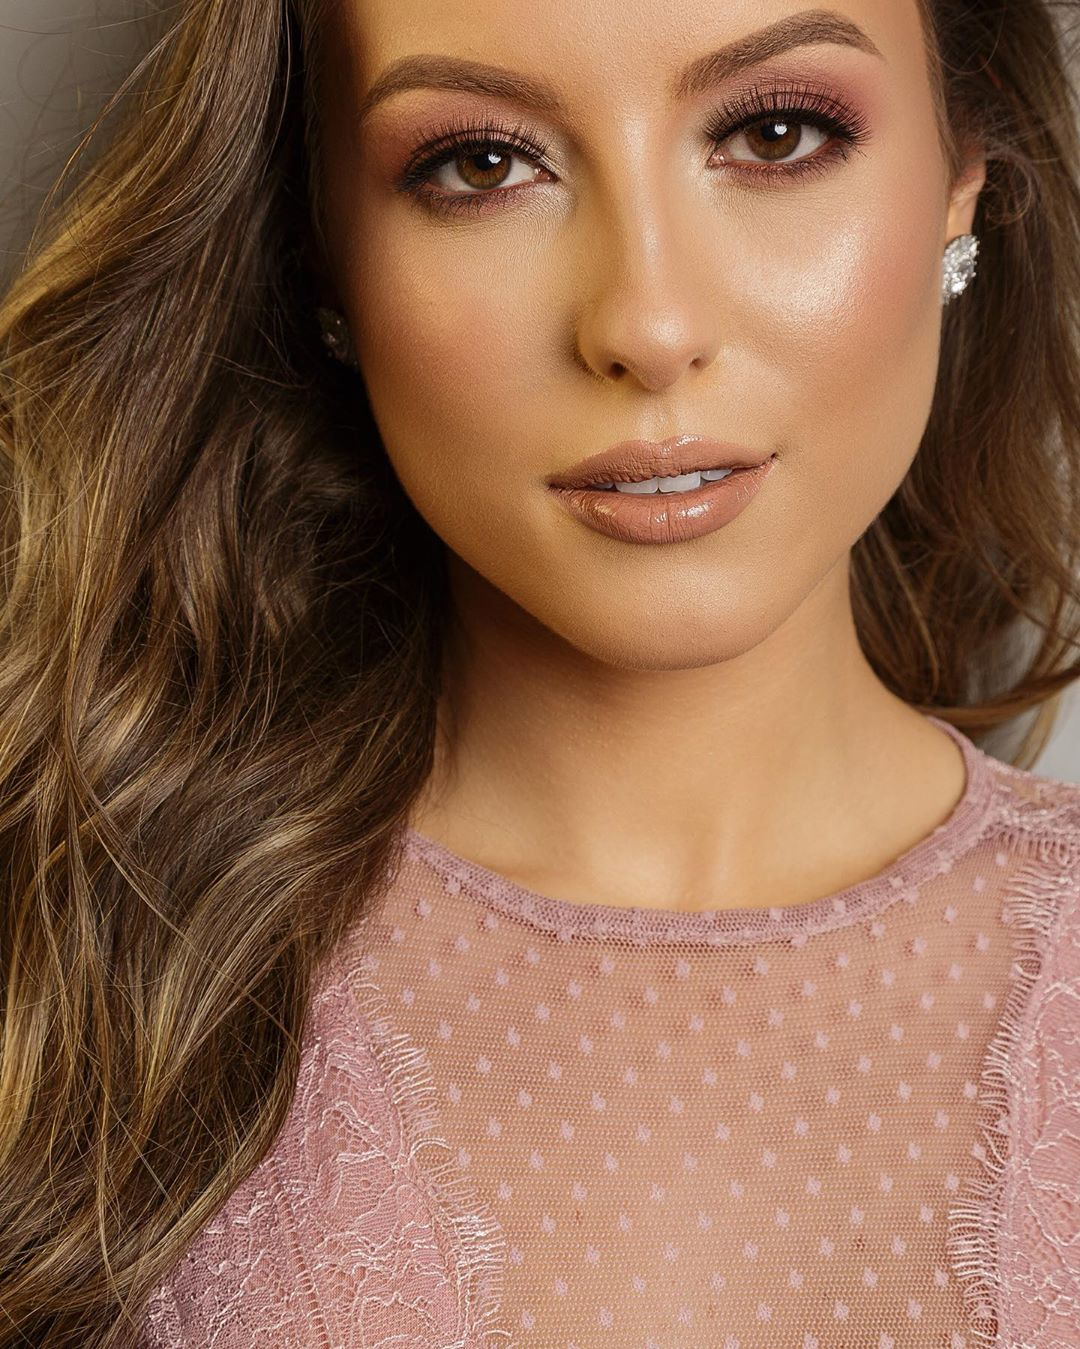 cristine boff sartor, segunda finalista de miss latinoamerica 2019. - Página 6 66487610